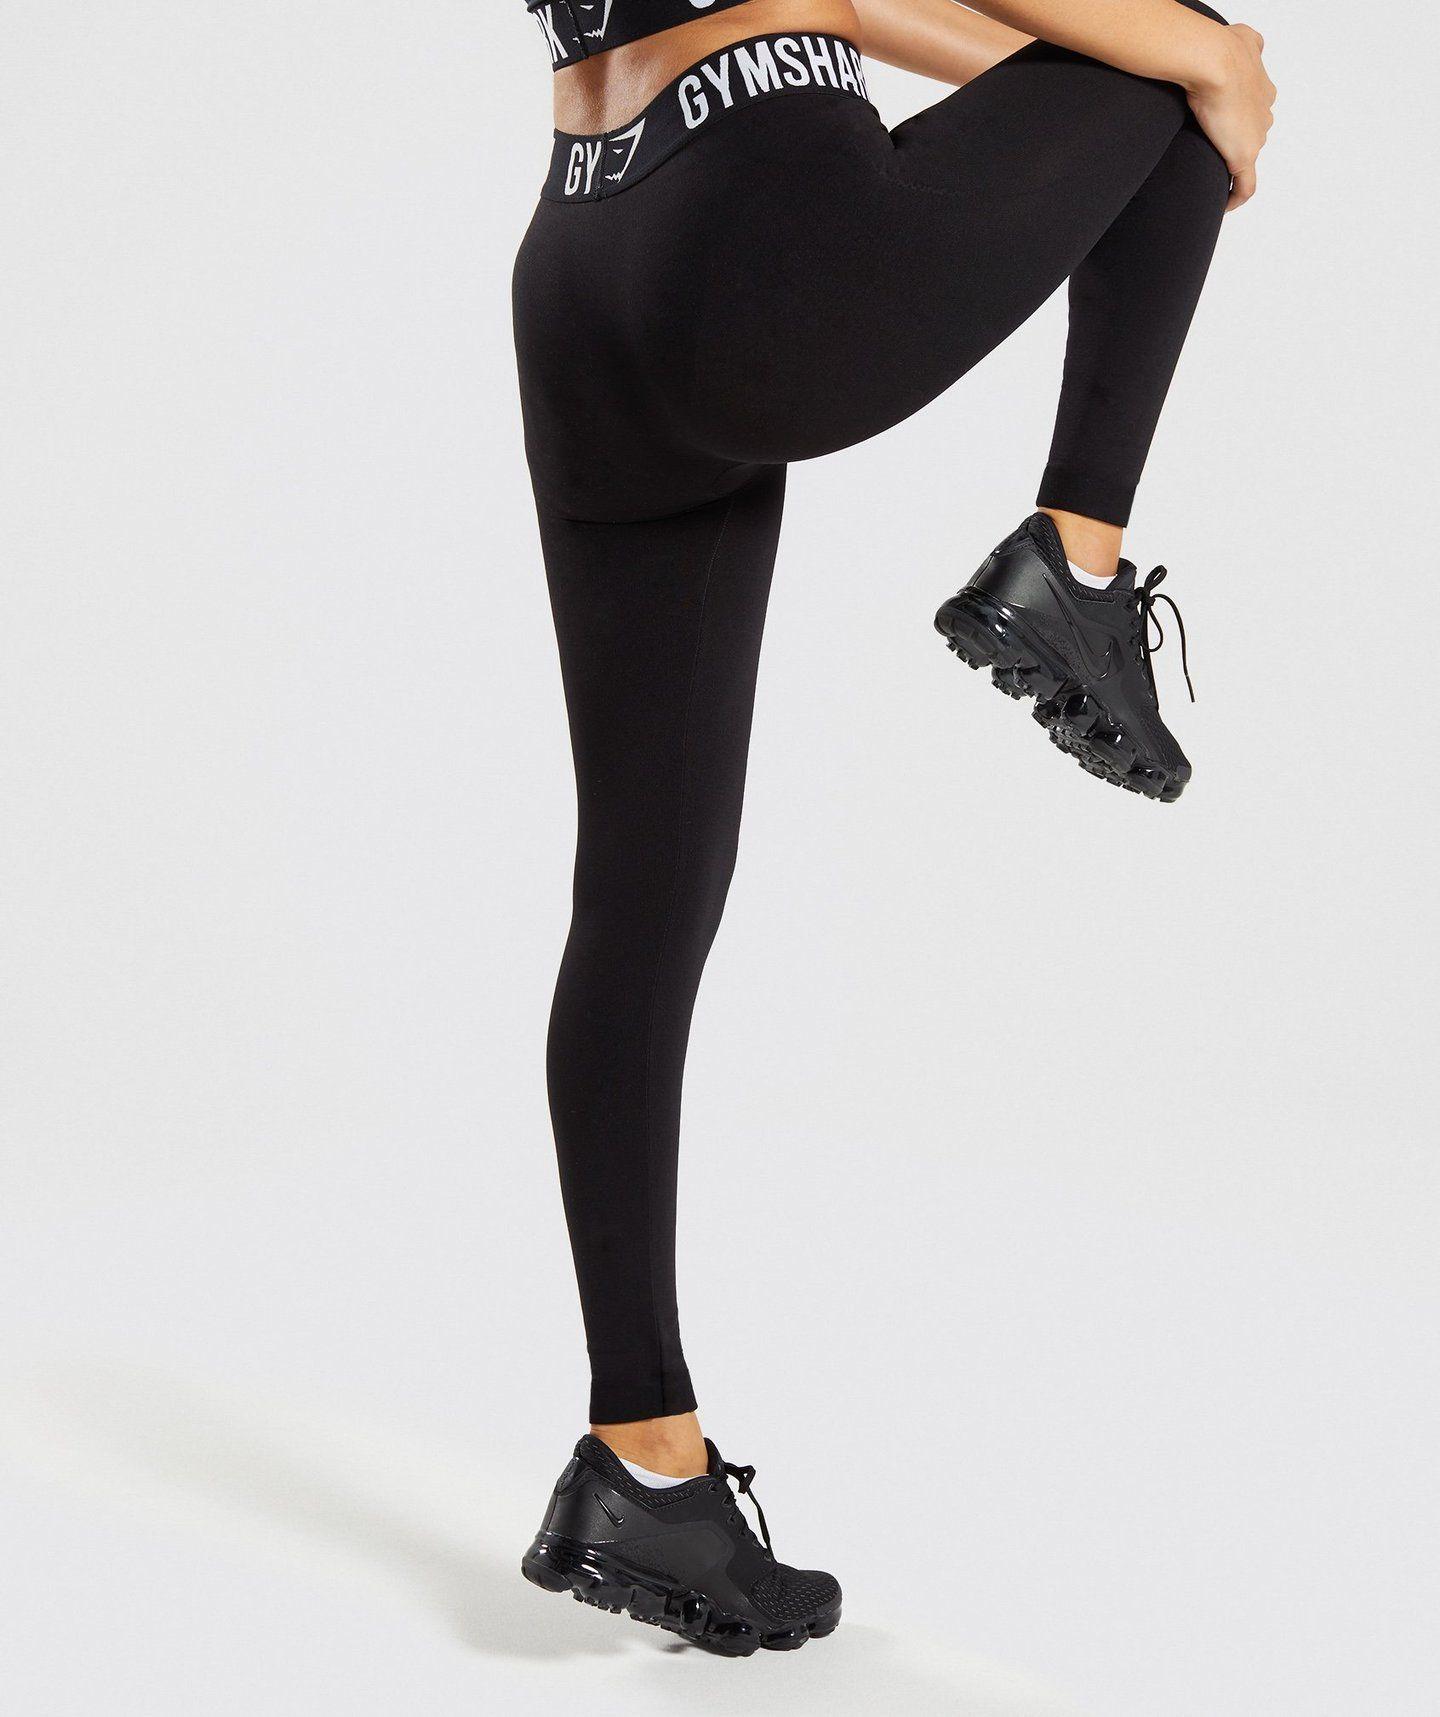 43bc4532c52d9f Gymshark Fit Leggings - Black/White   Stuff to buy   Workout ...